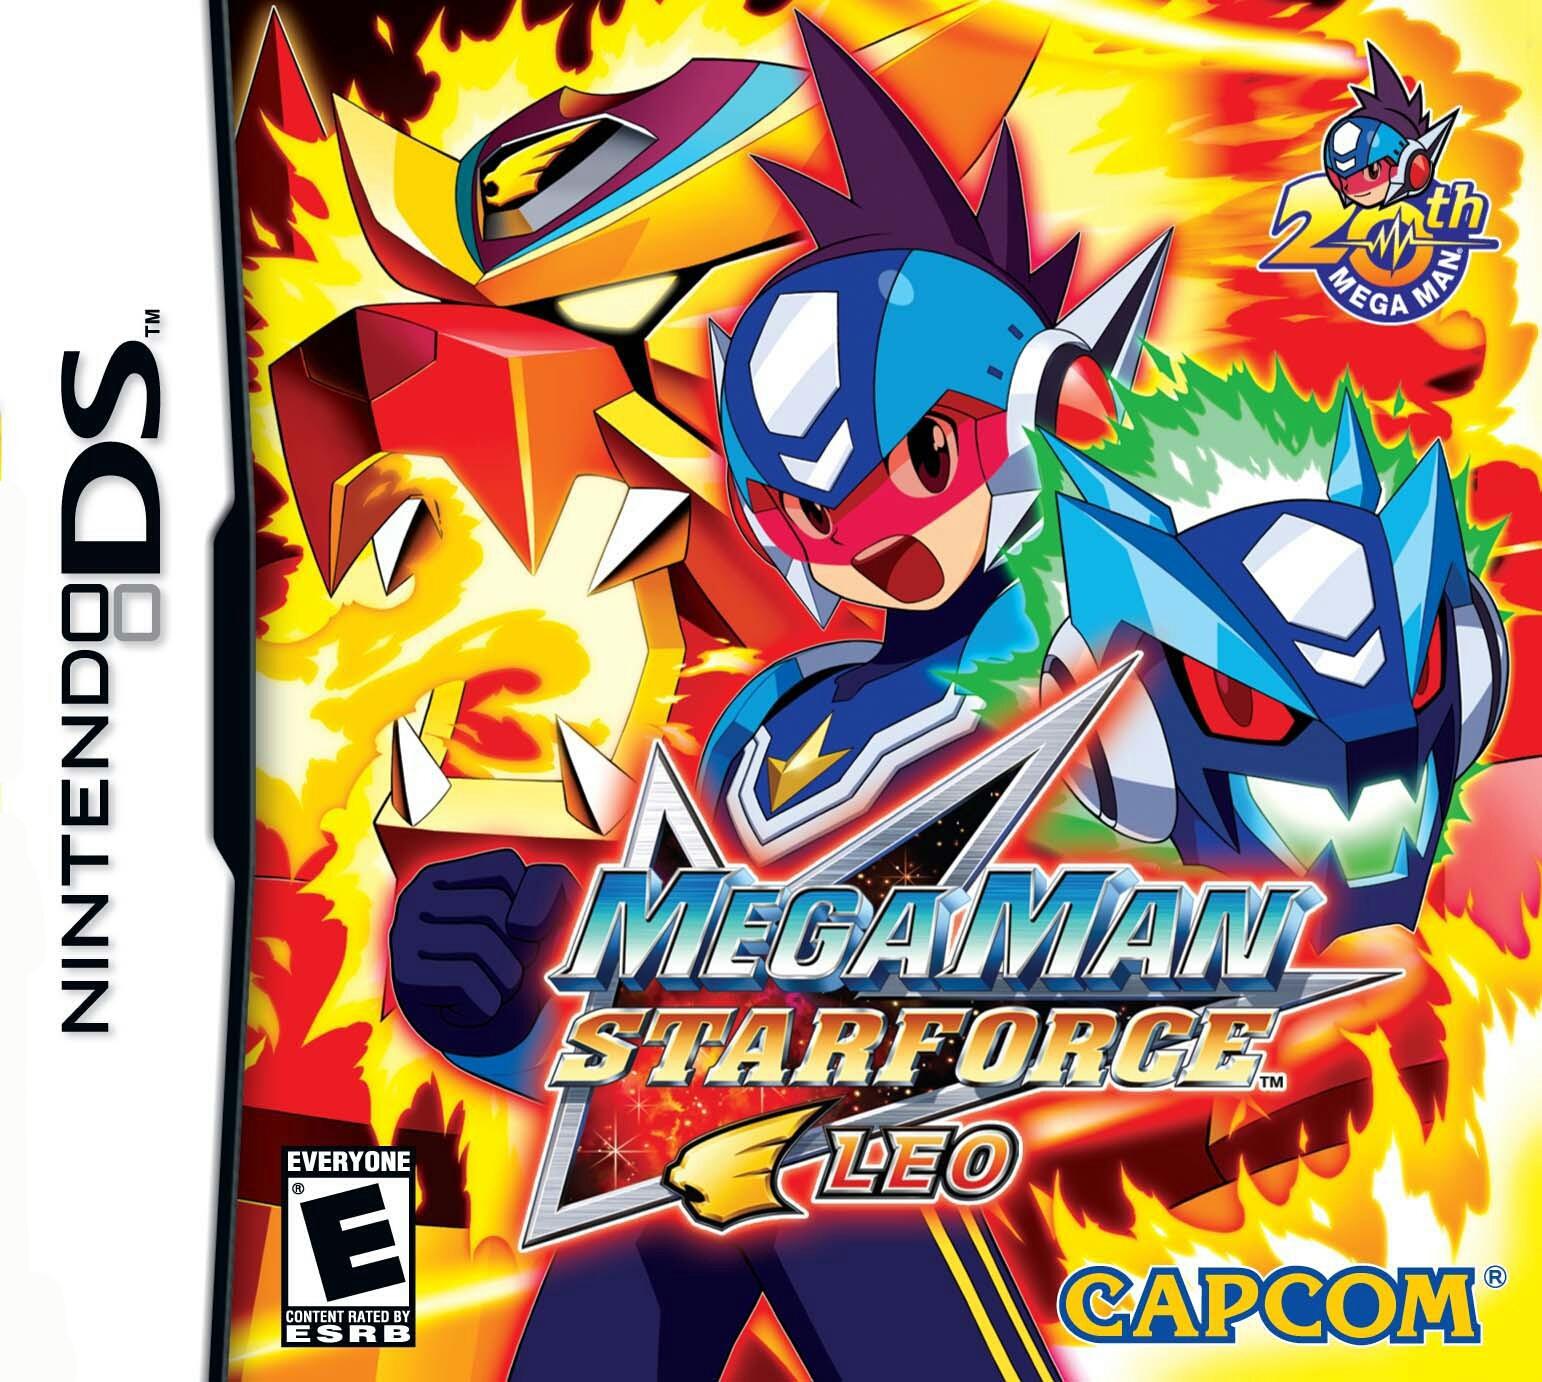 Mega man star force video game mmkb fandom powered - Megaman wikia ...